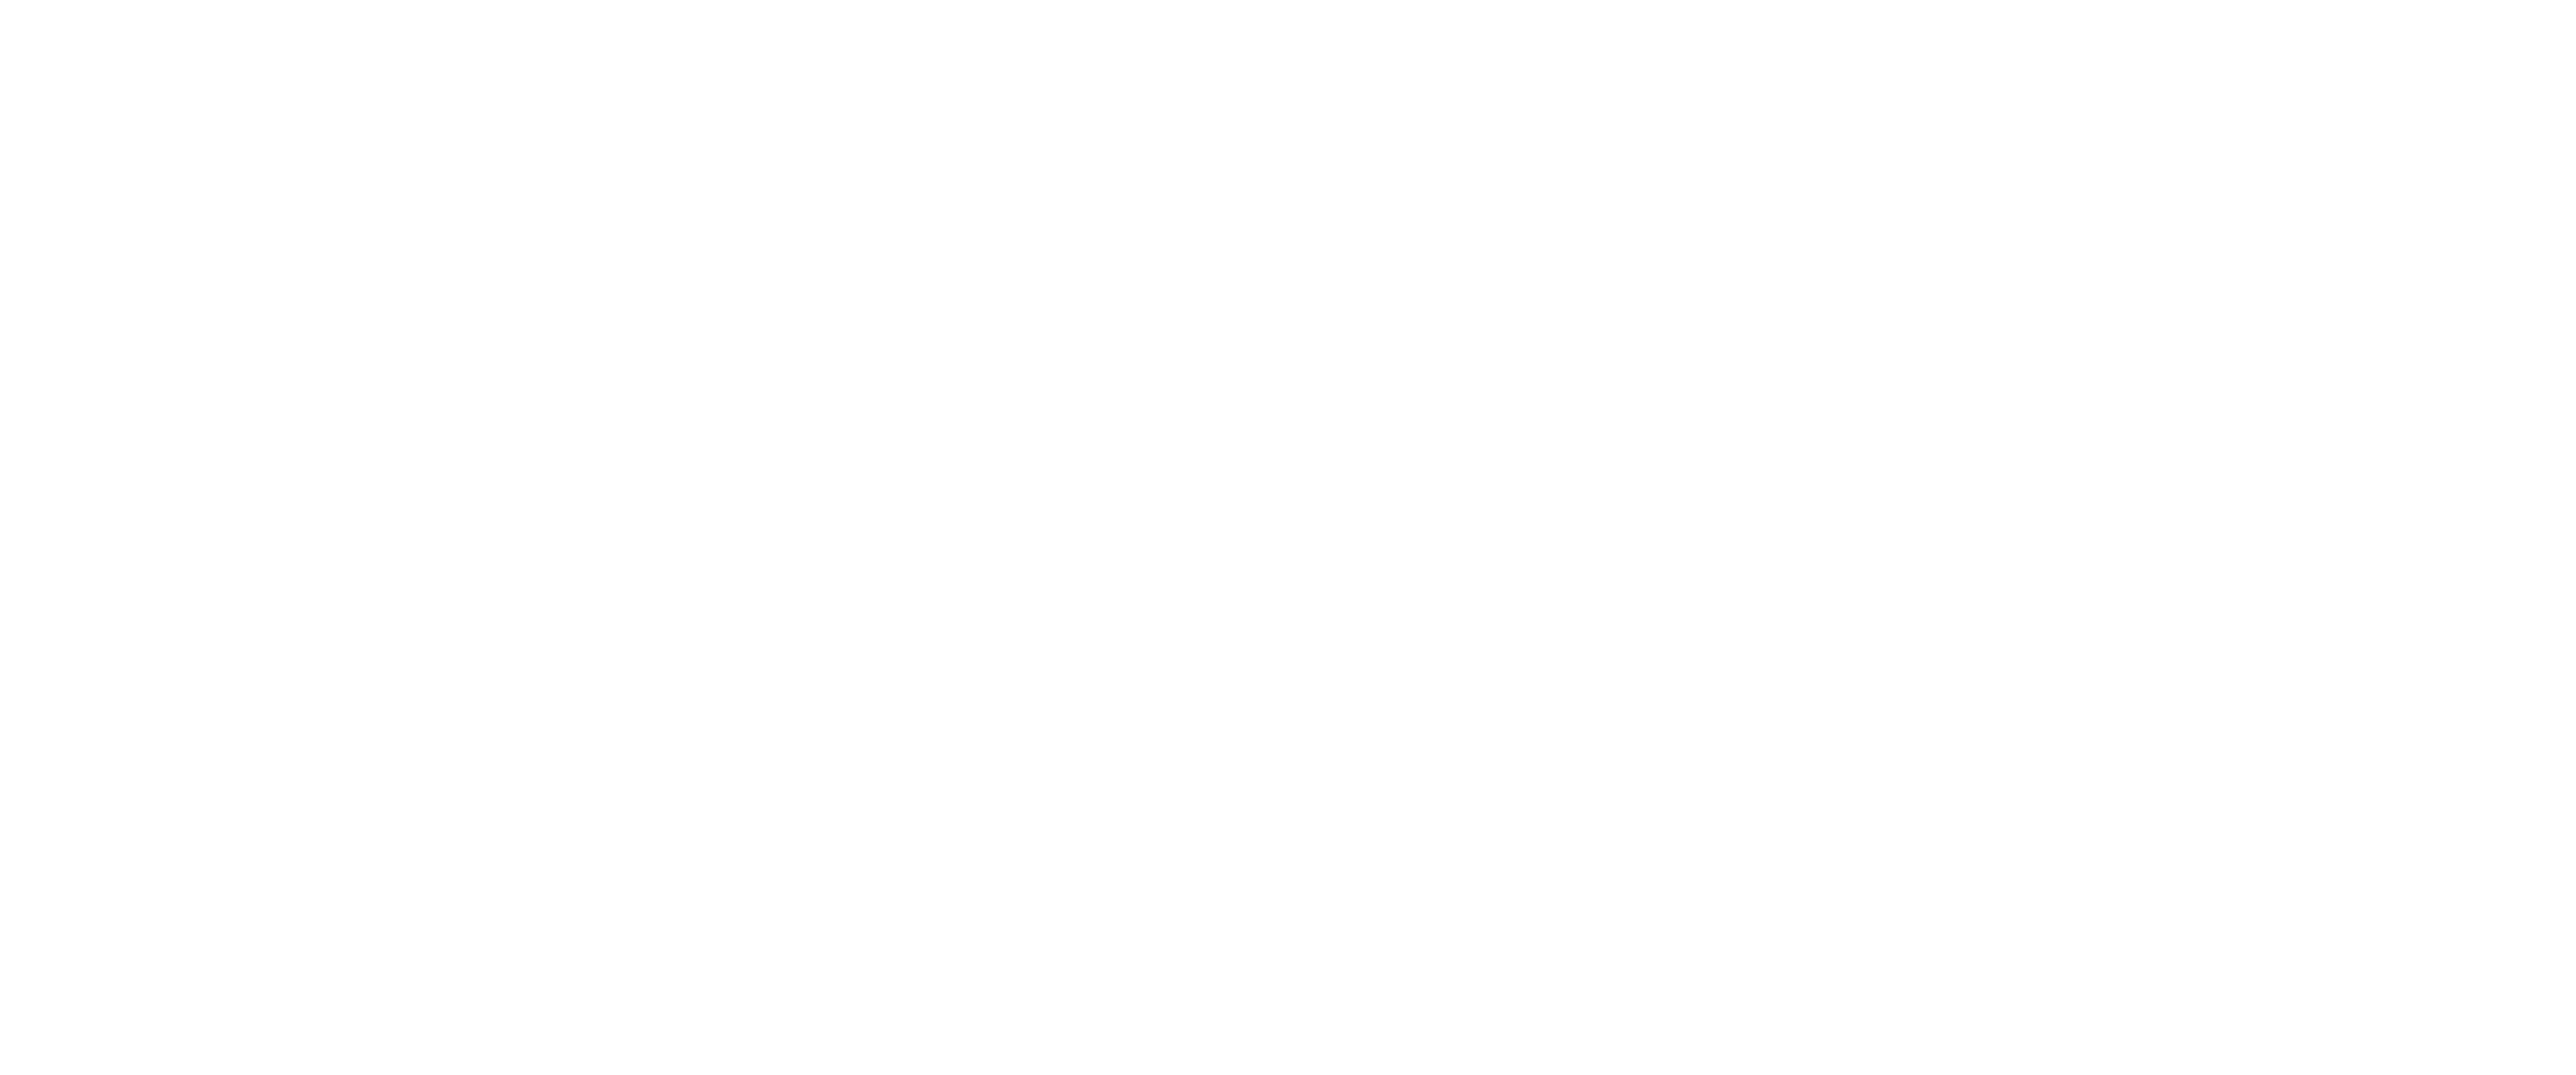 image freeuse stock Ornament style transparent png. Lace clipart clip art.